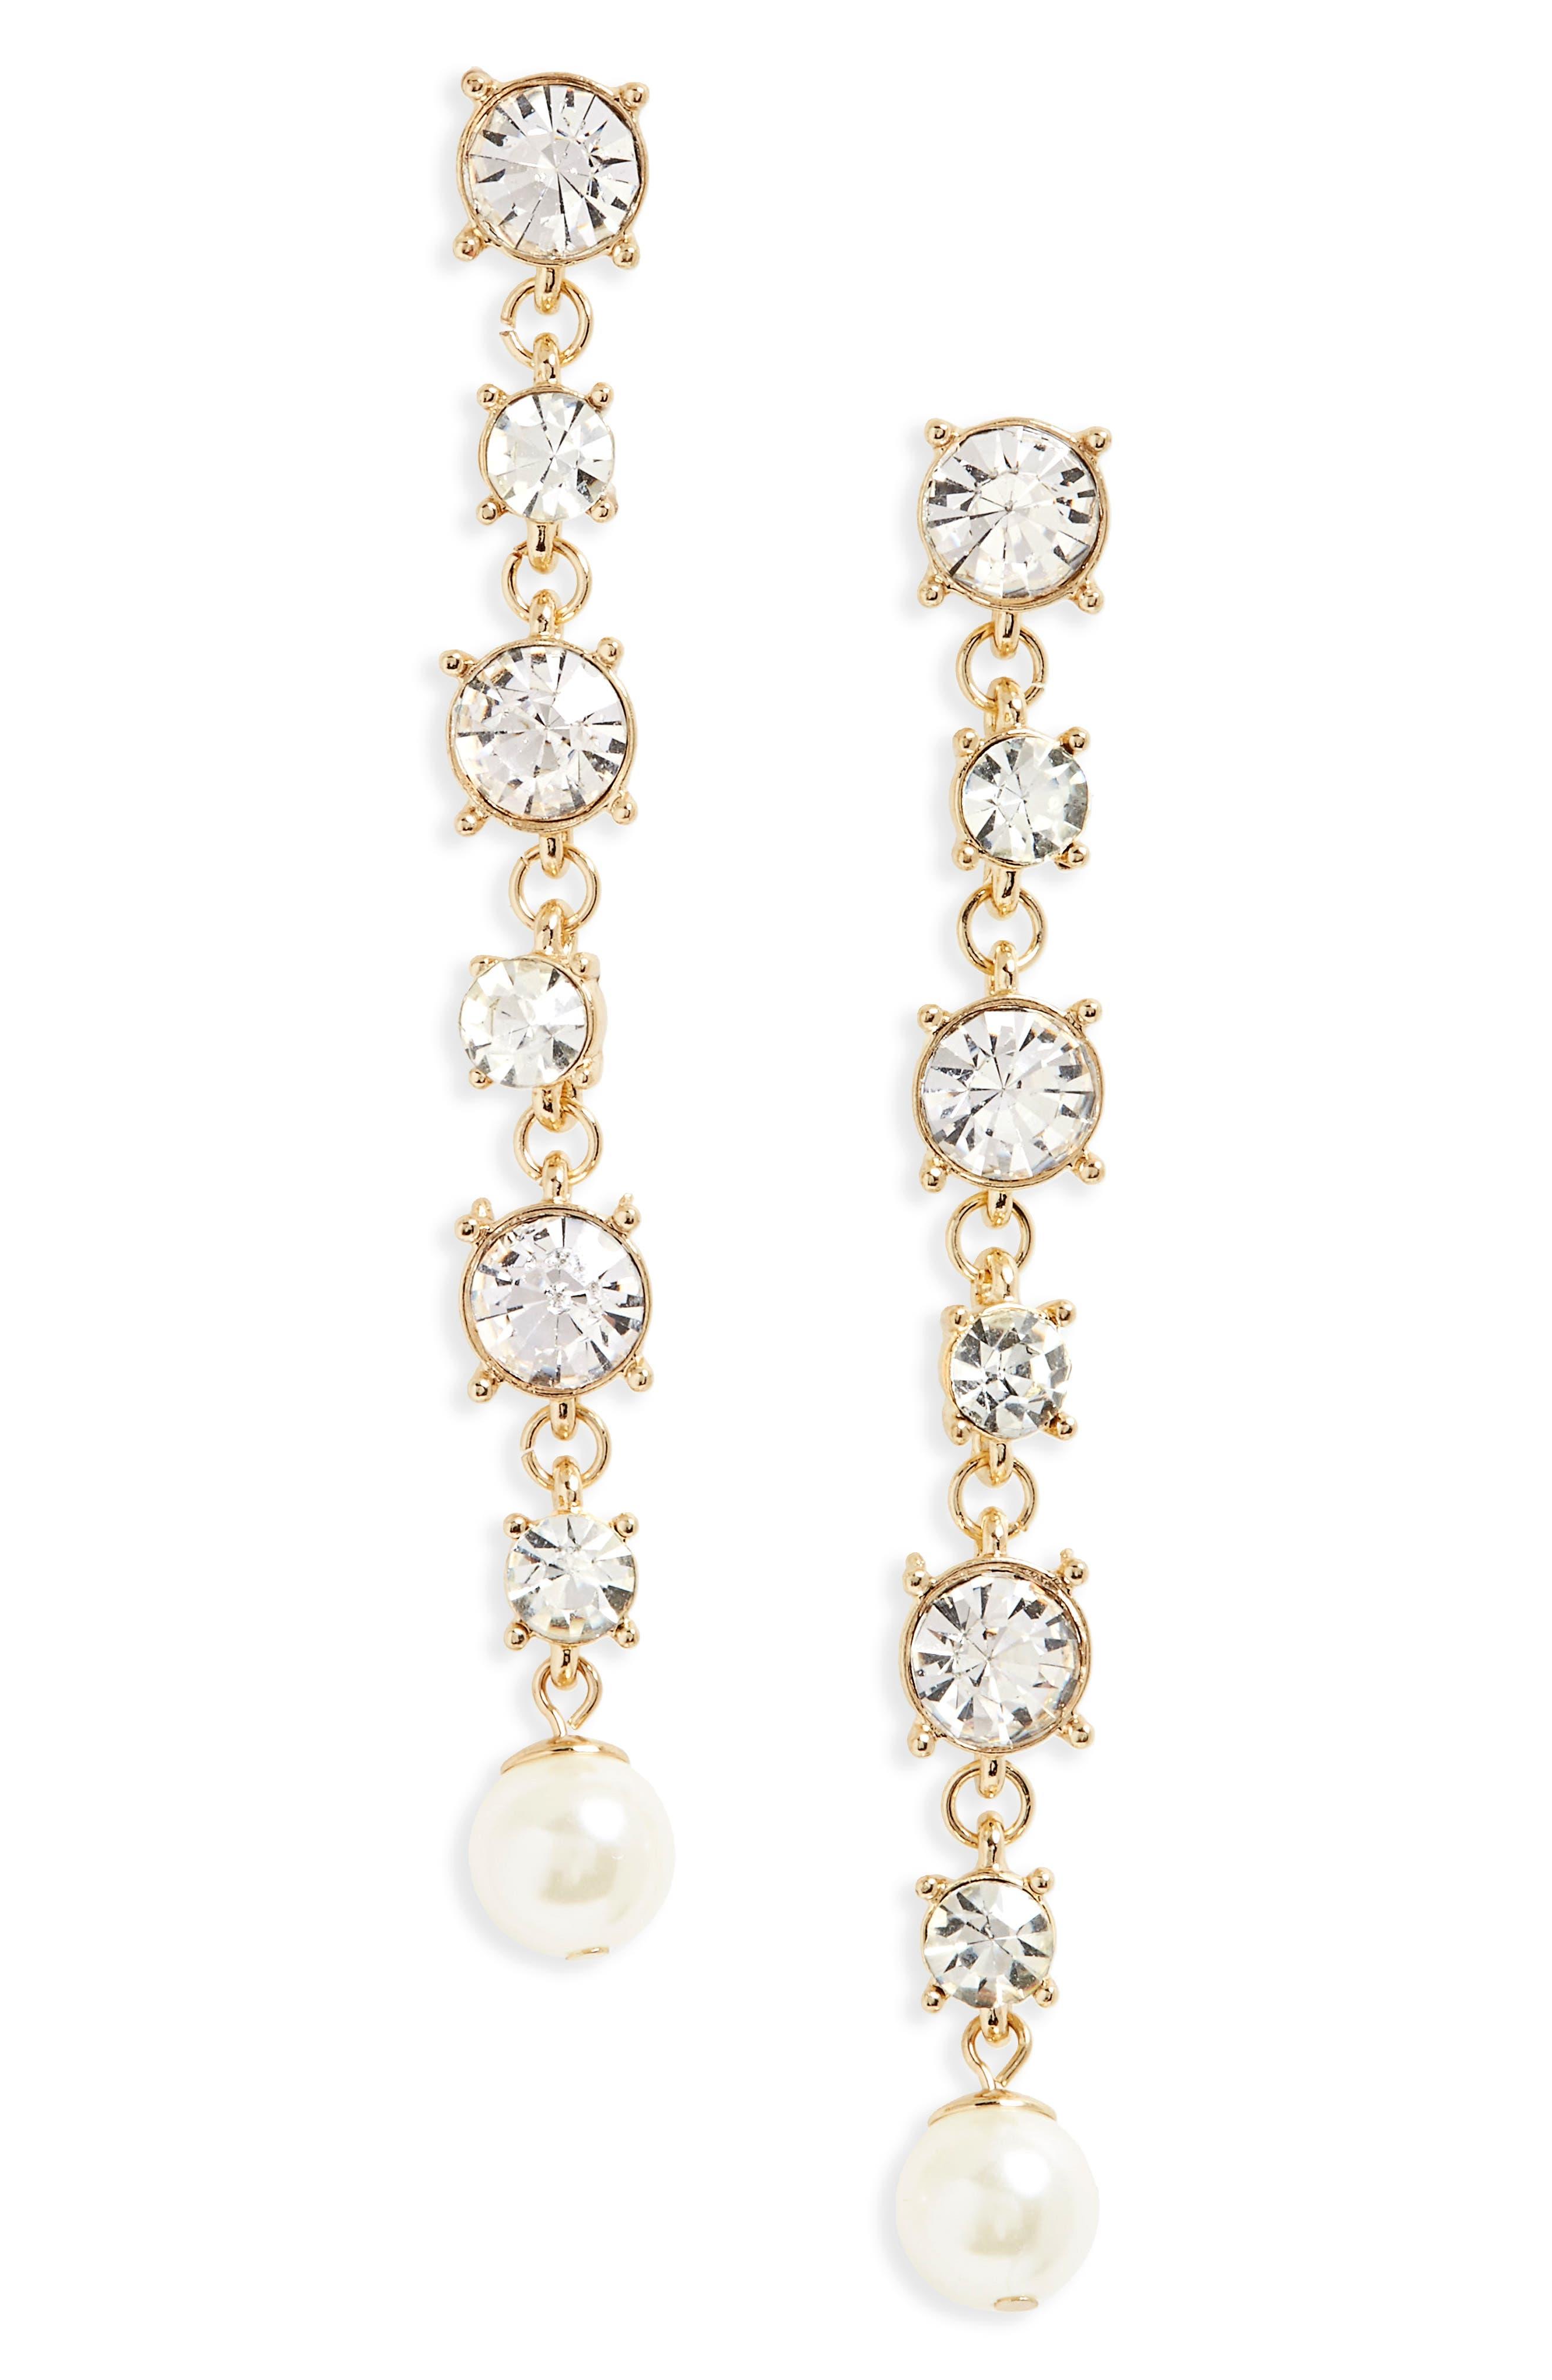 Main Image - Girly Crystal & Imitation Pearl Drop Earrings